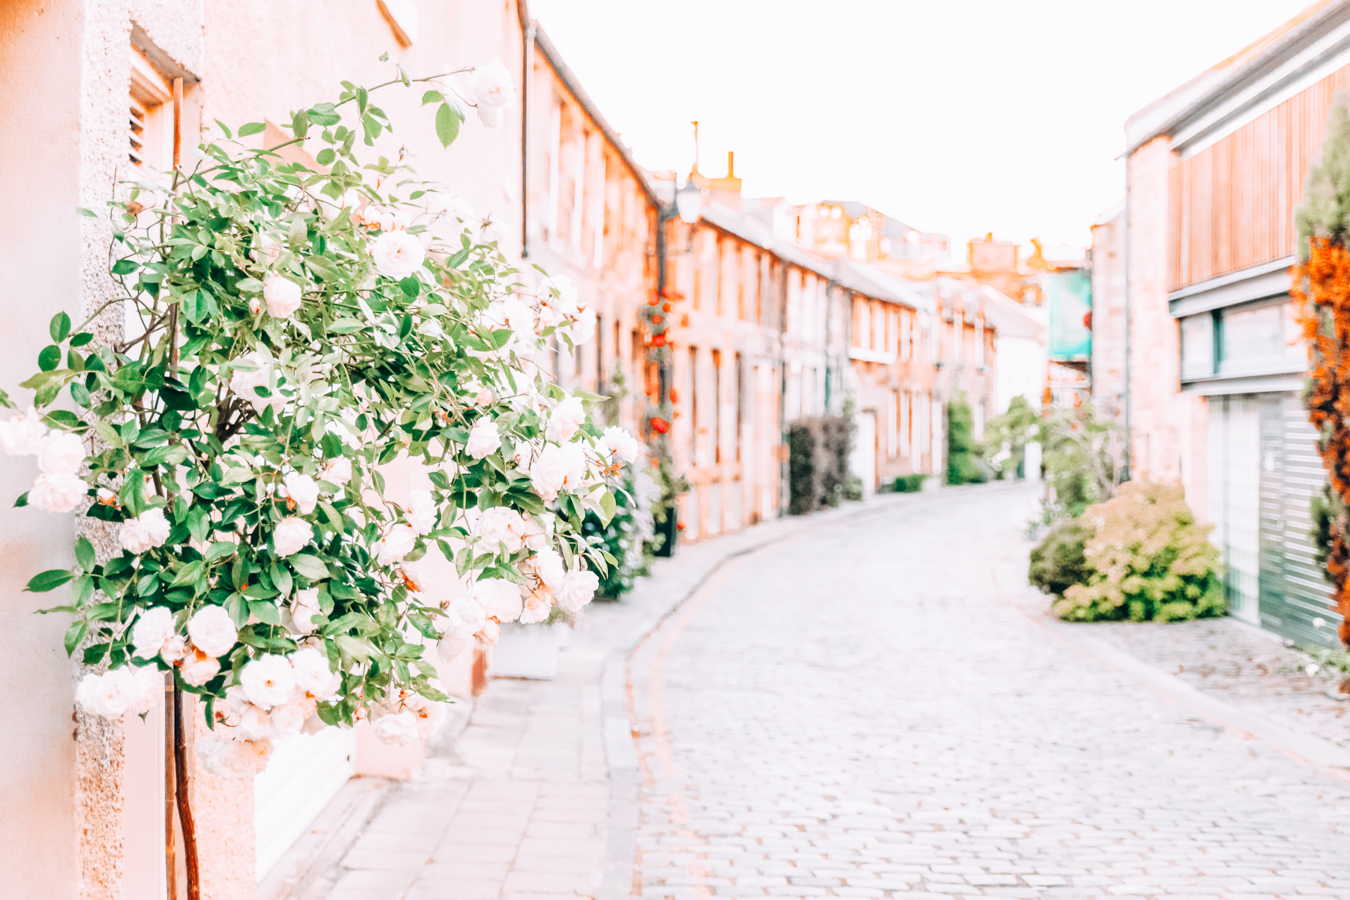 Street with flowers in Edinburgh